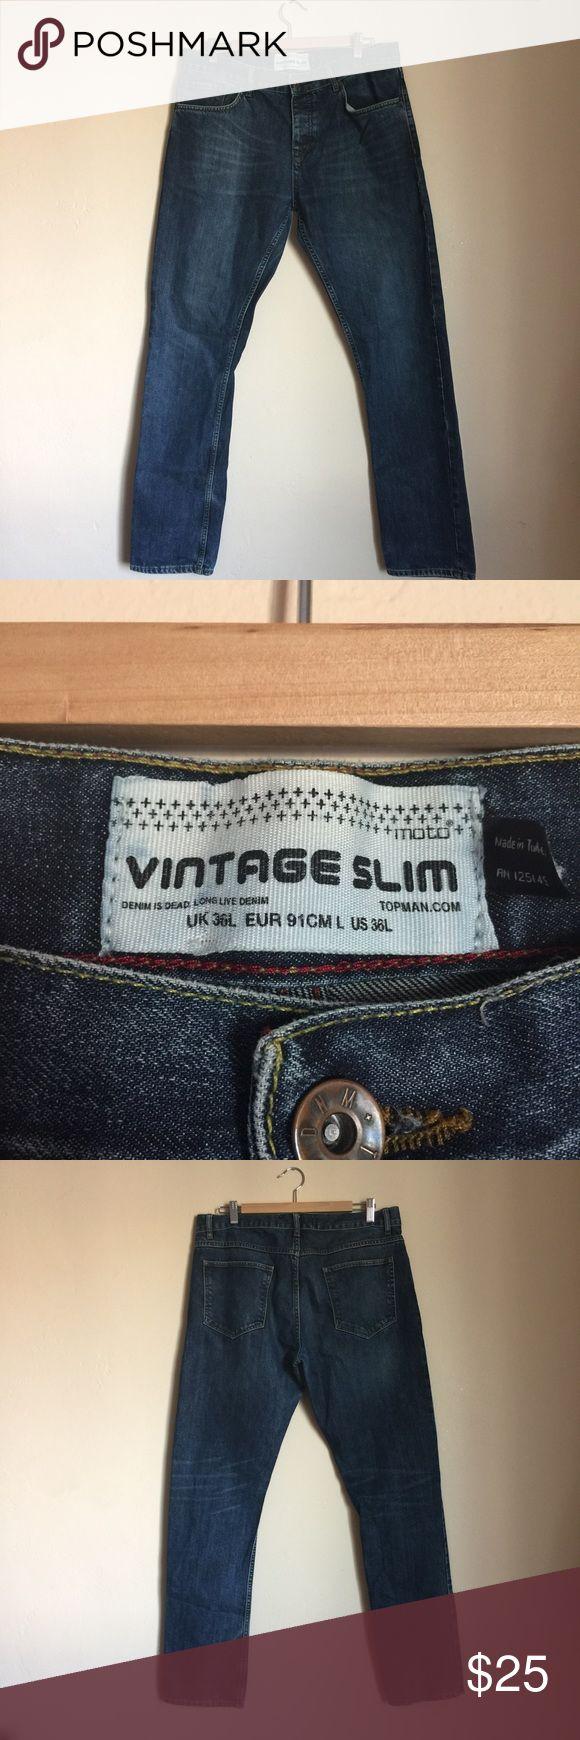 Topman Mens Jeans Topman Mens Jeans. Made in Turkey Size 36 x 32. Vintage Slim Topman Jeans Slim